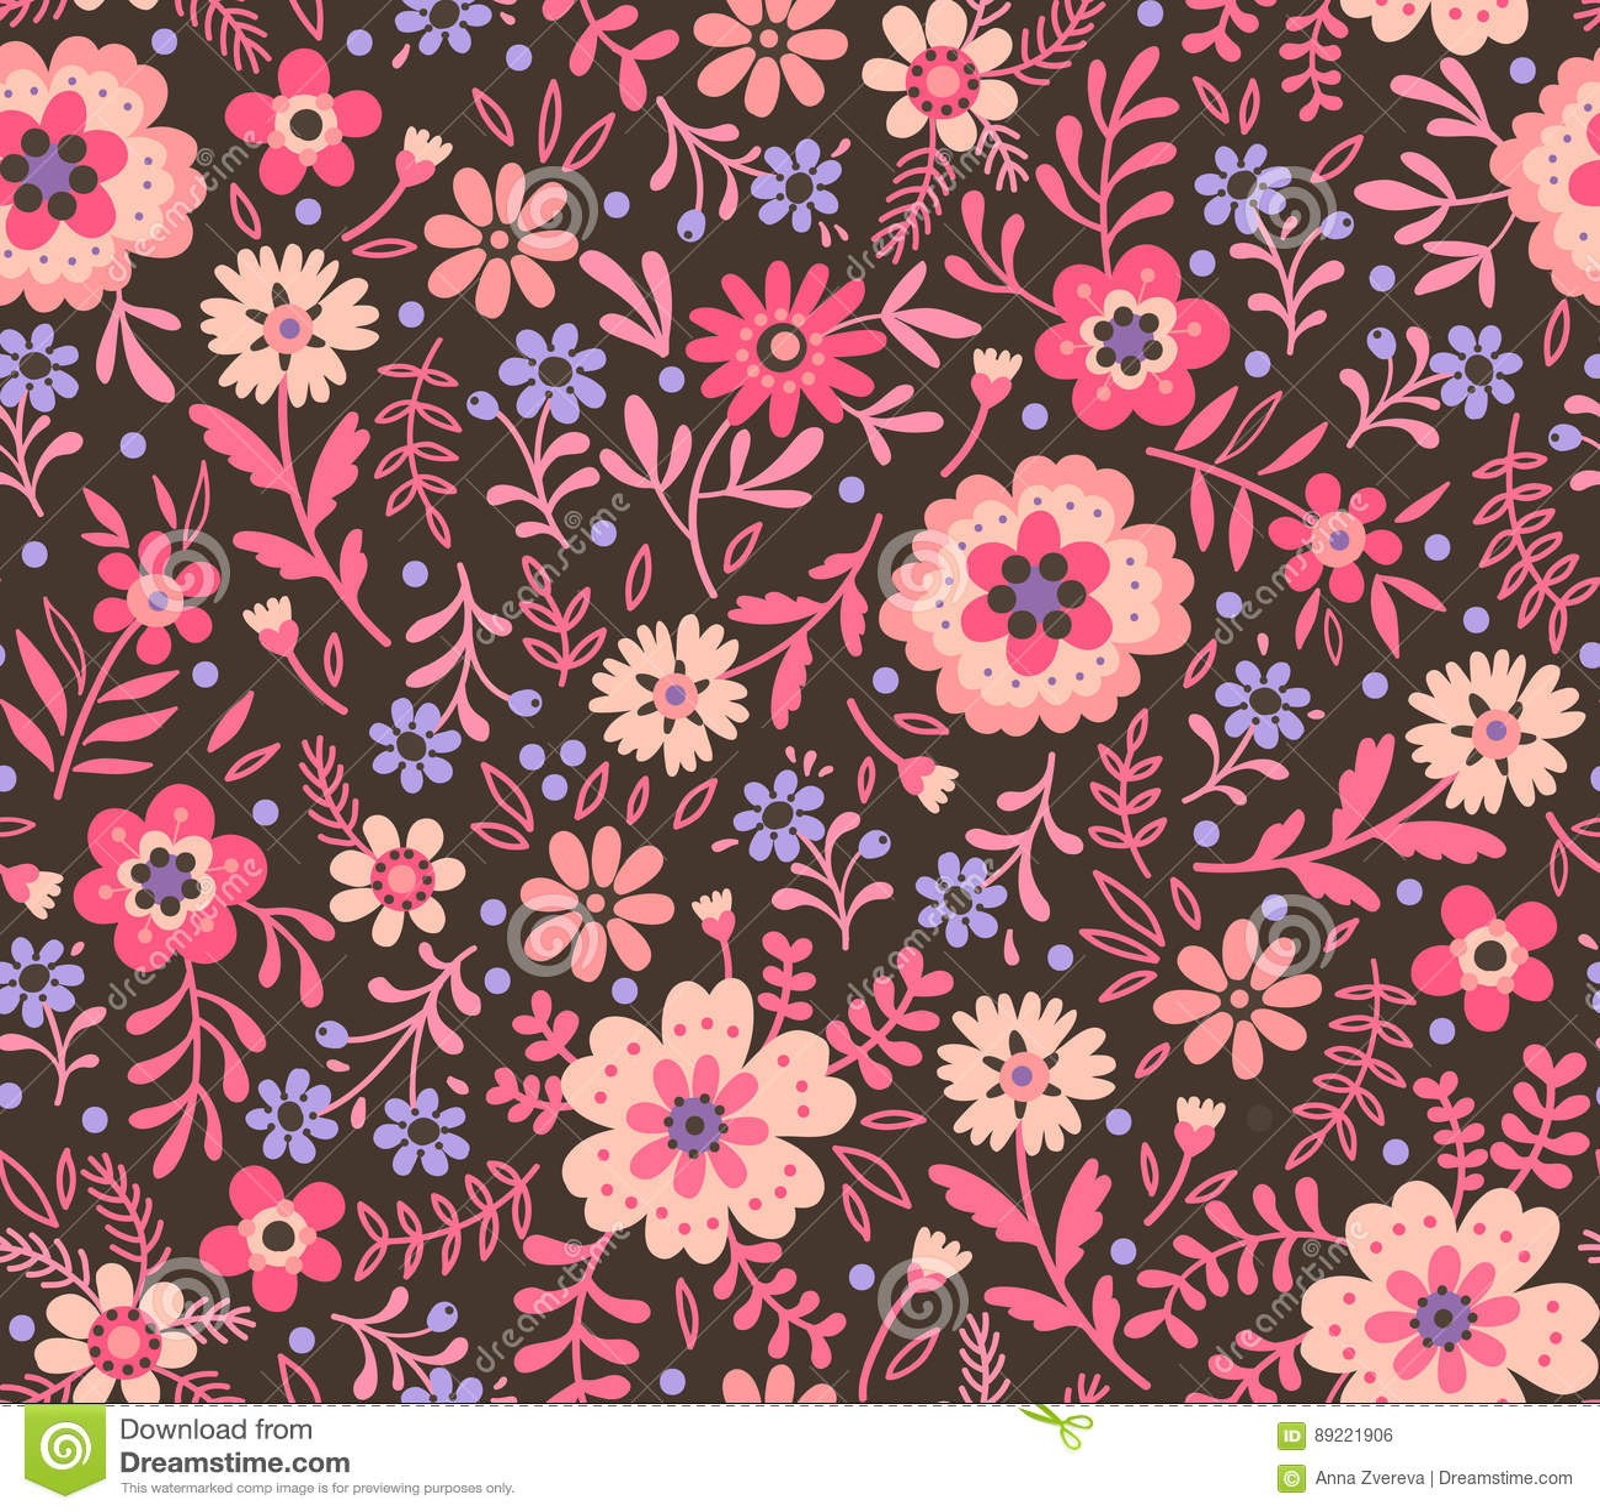 Cute Floral Pattern Stock Illustration Illustration Of Elegant